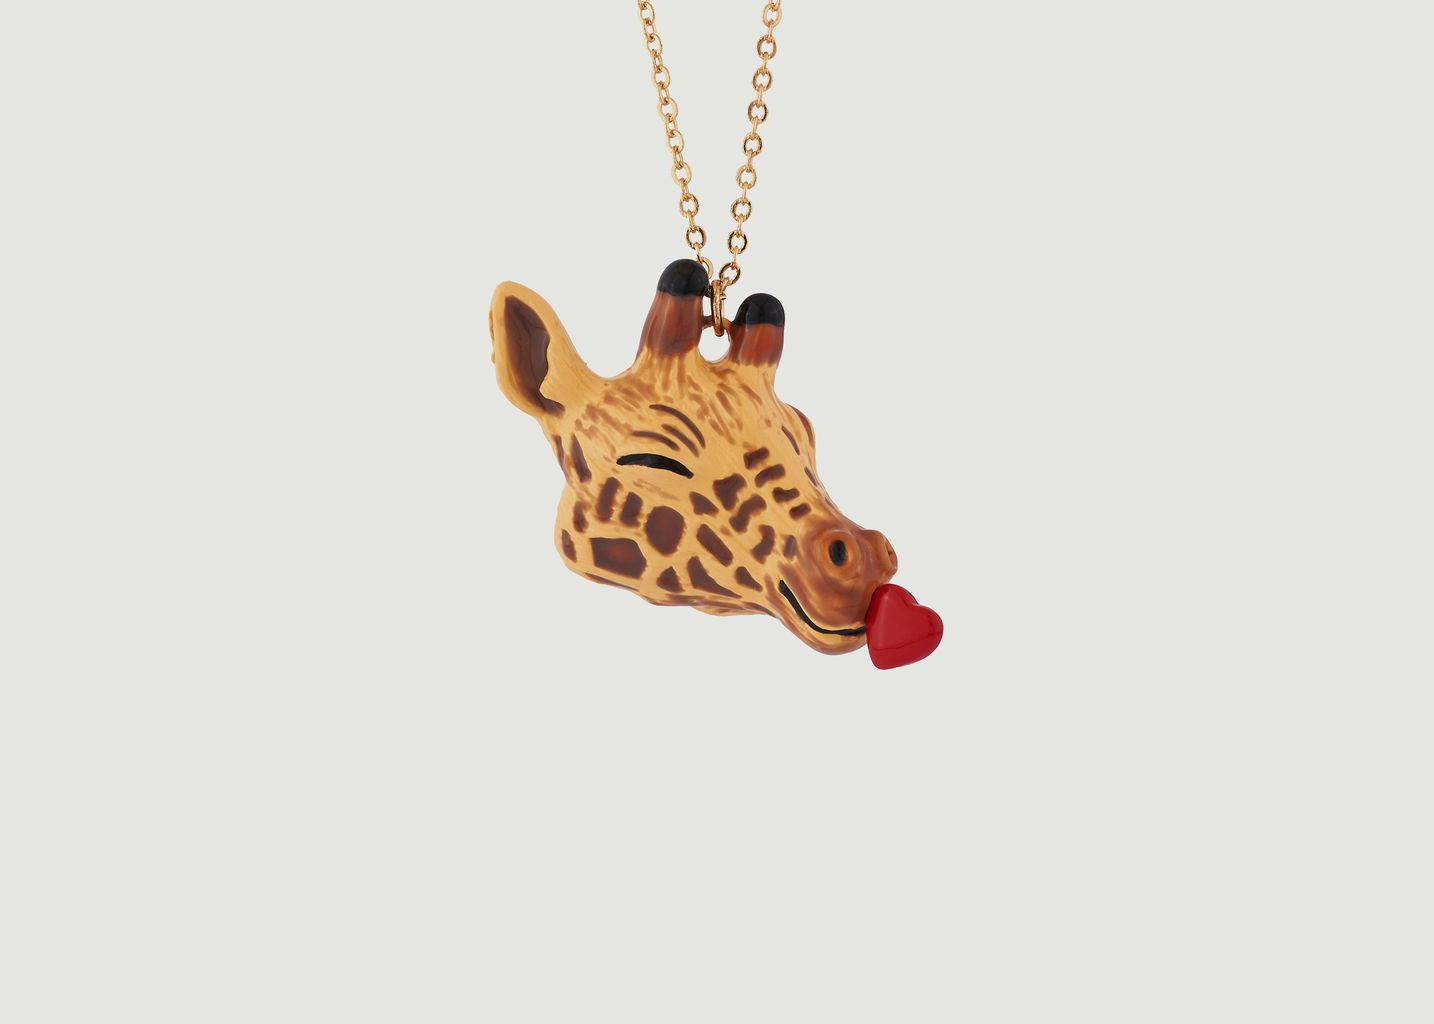 Sautoir Girafe Pleine d'Amour - N2